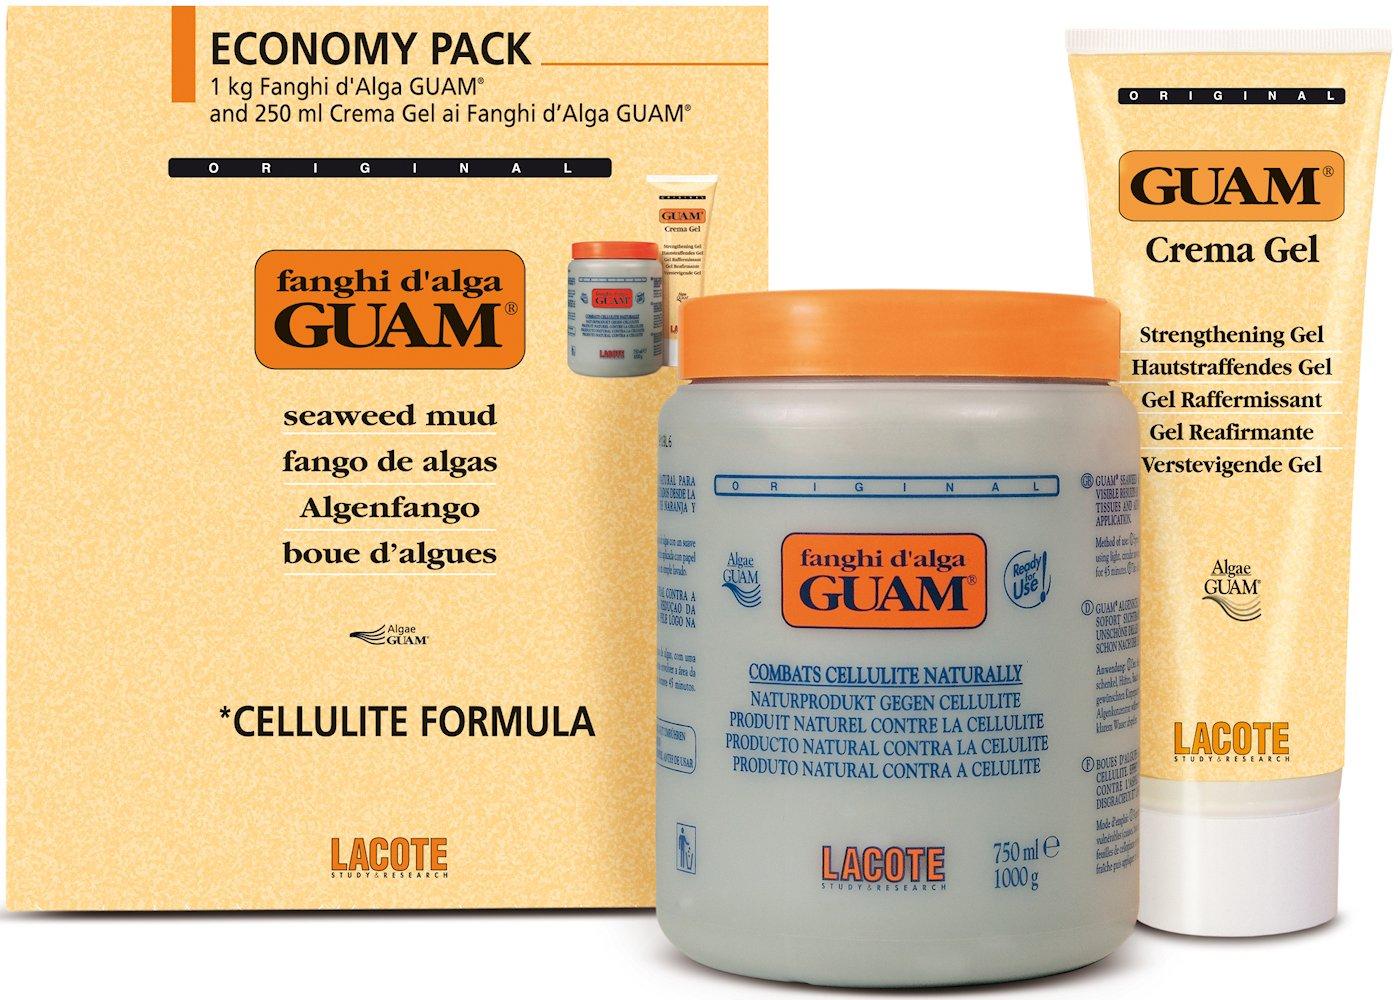 Guam anti cellulite erfahrungen